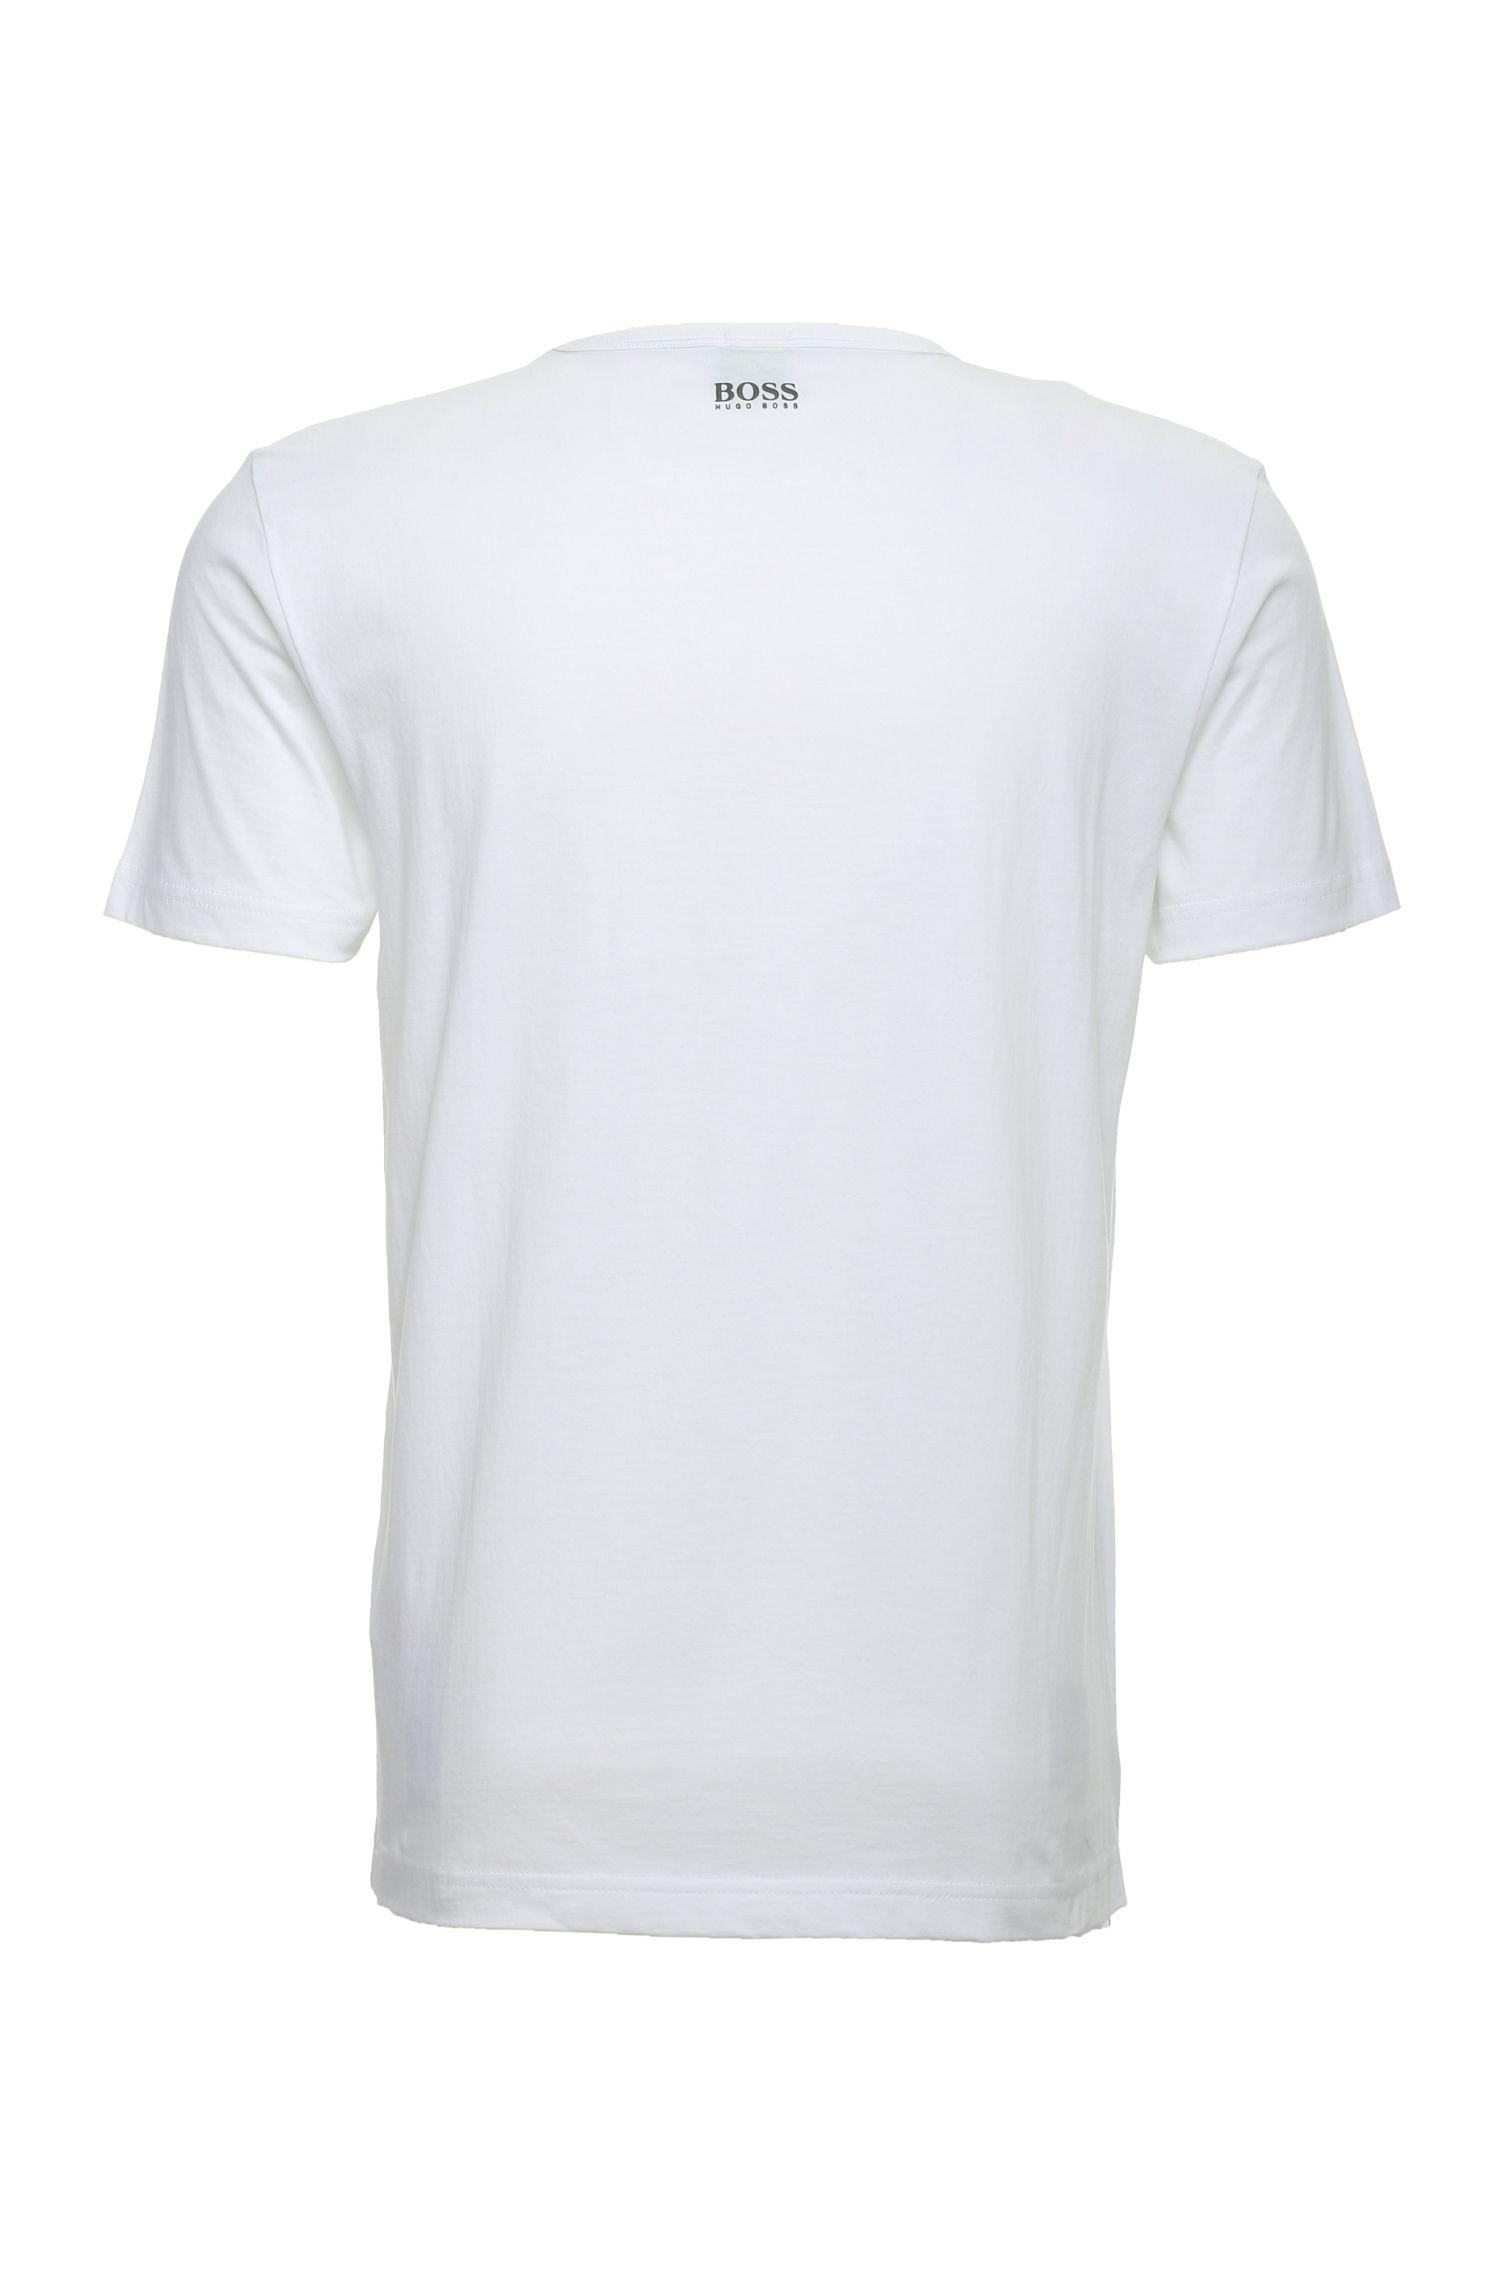 Lockeres Print-Shirt aus Baumwolljersey: ´Tee 3`